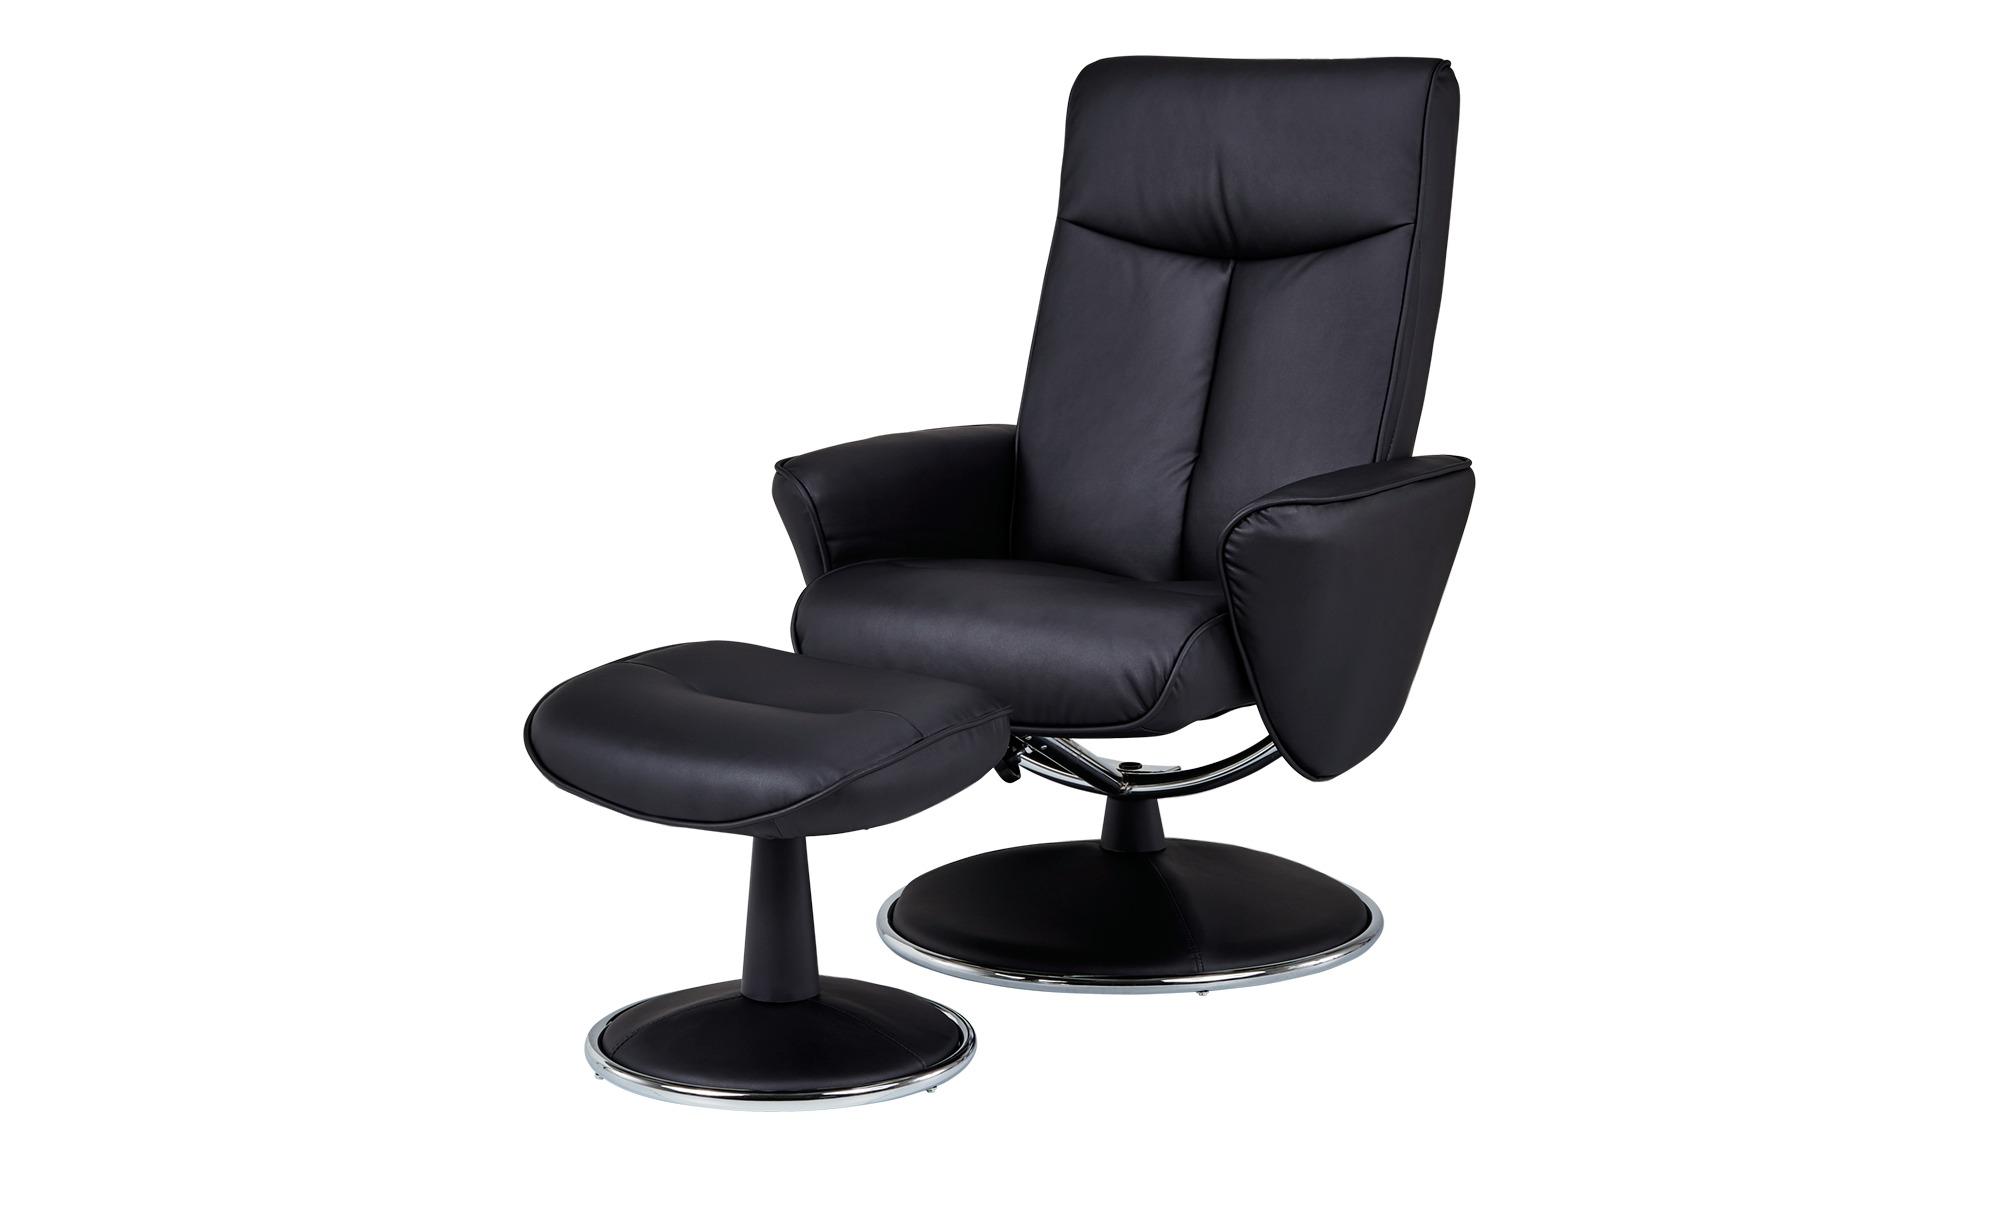 Relaxsessel schwarz - Kunstleder Abby ¦ schwarz ¦ Maße (cm): B: 82 H: 104,5 T: 110 Polstermöbel > Sessel > Fernsehsessel - Höffner